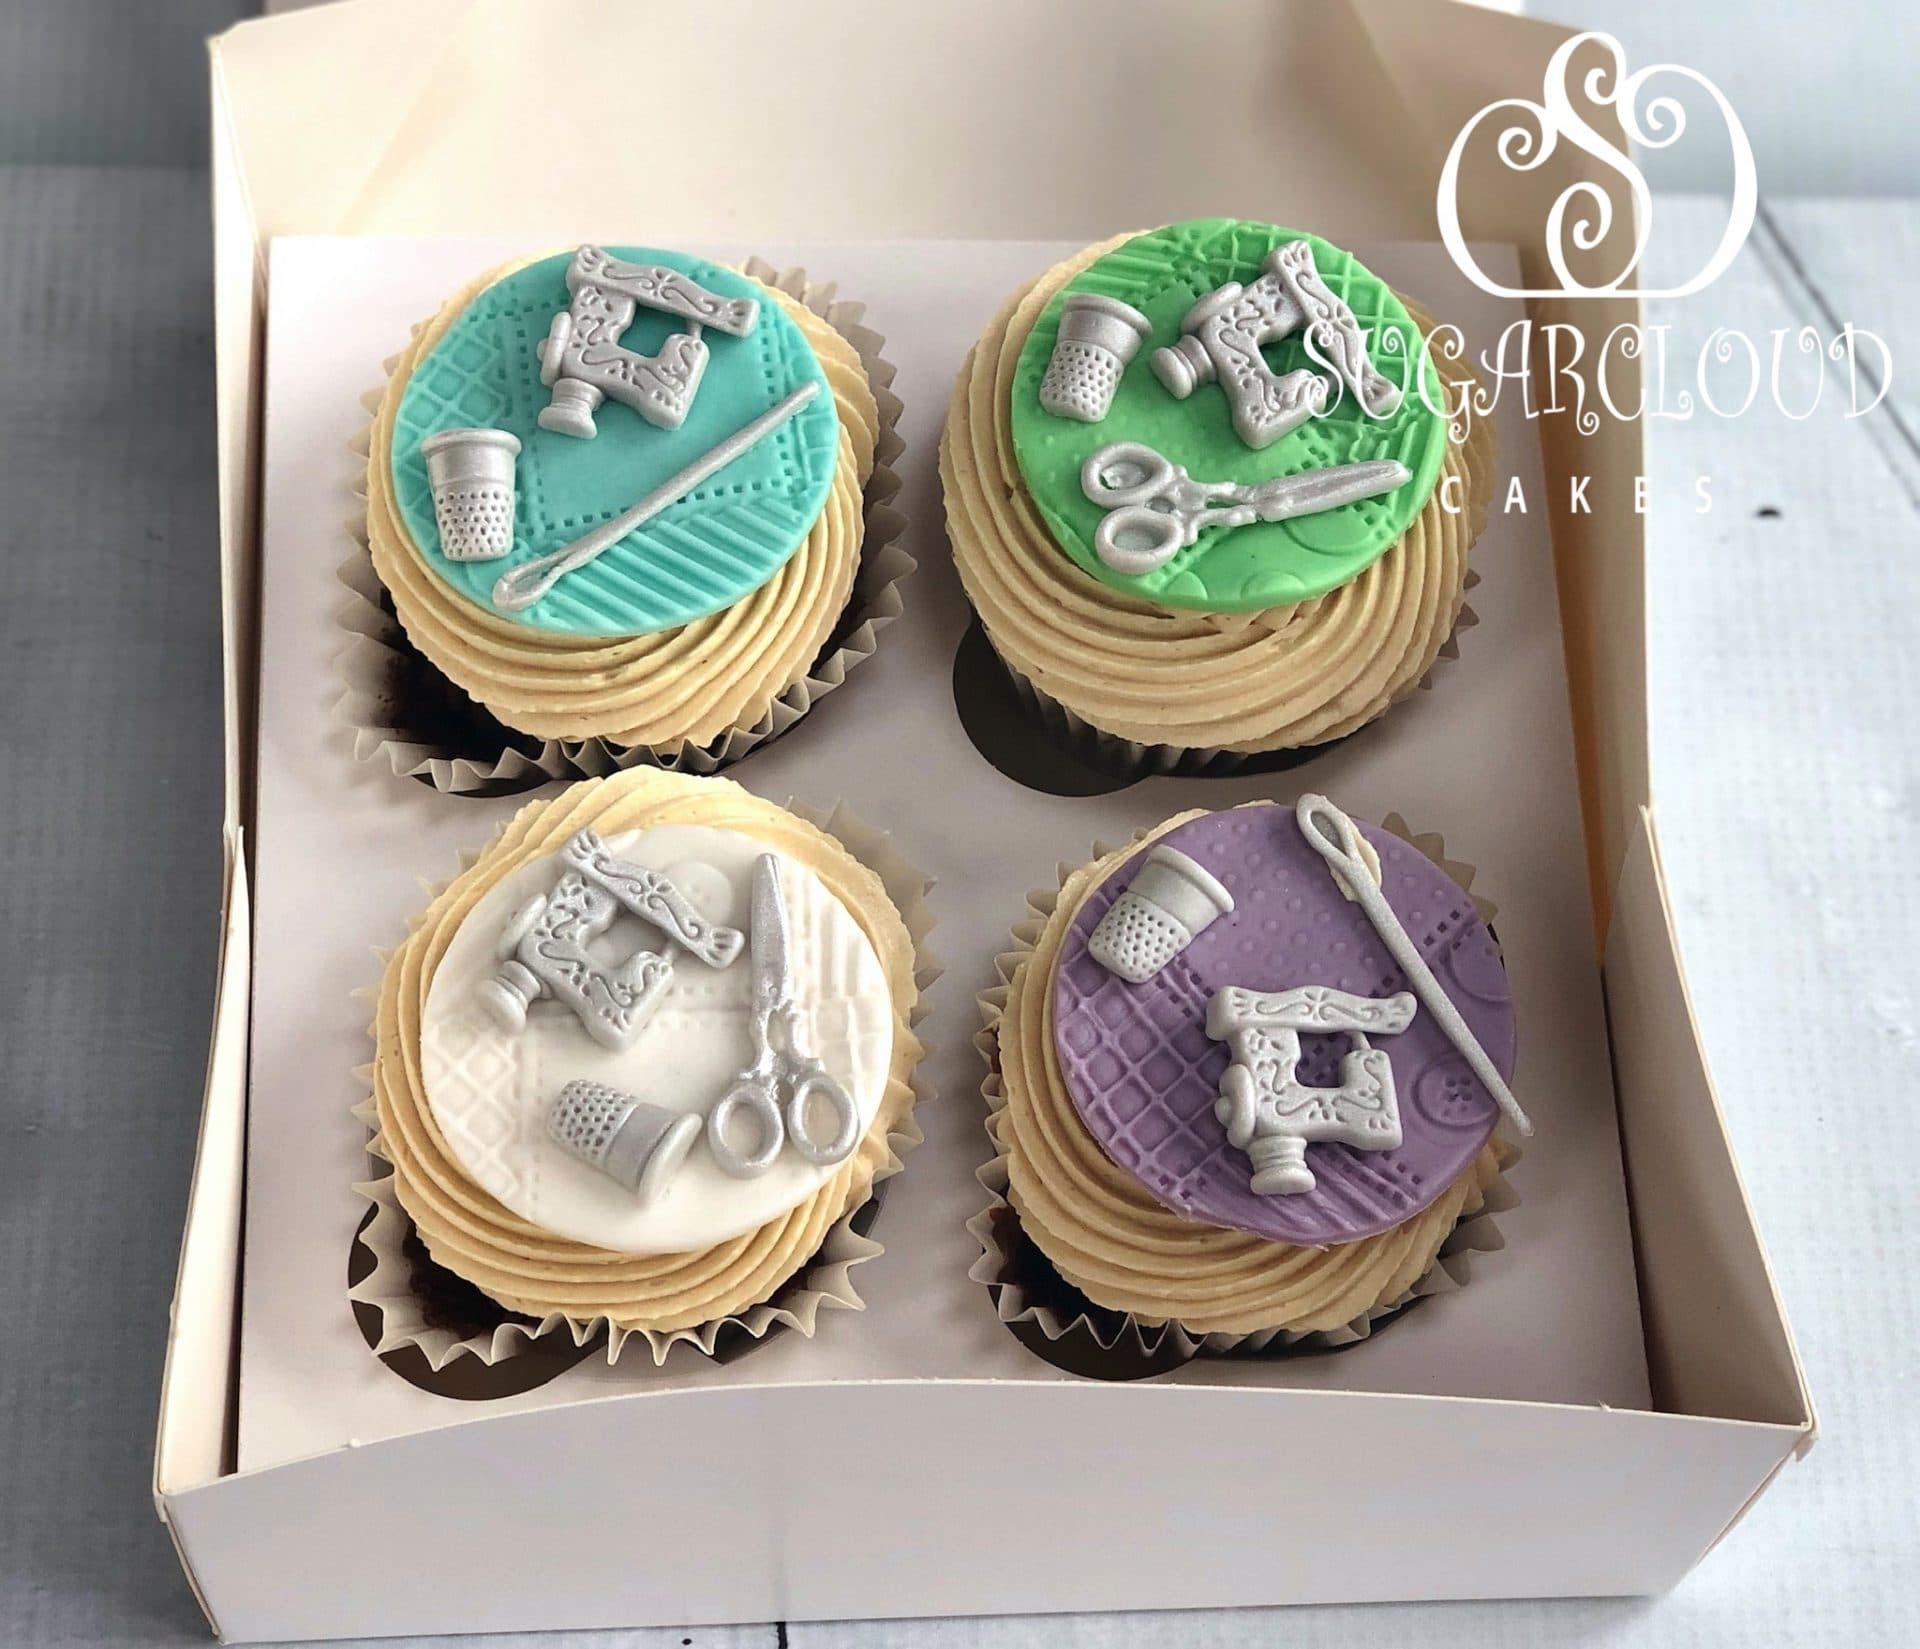 Matching gluten free cupcakes